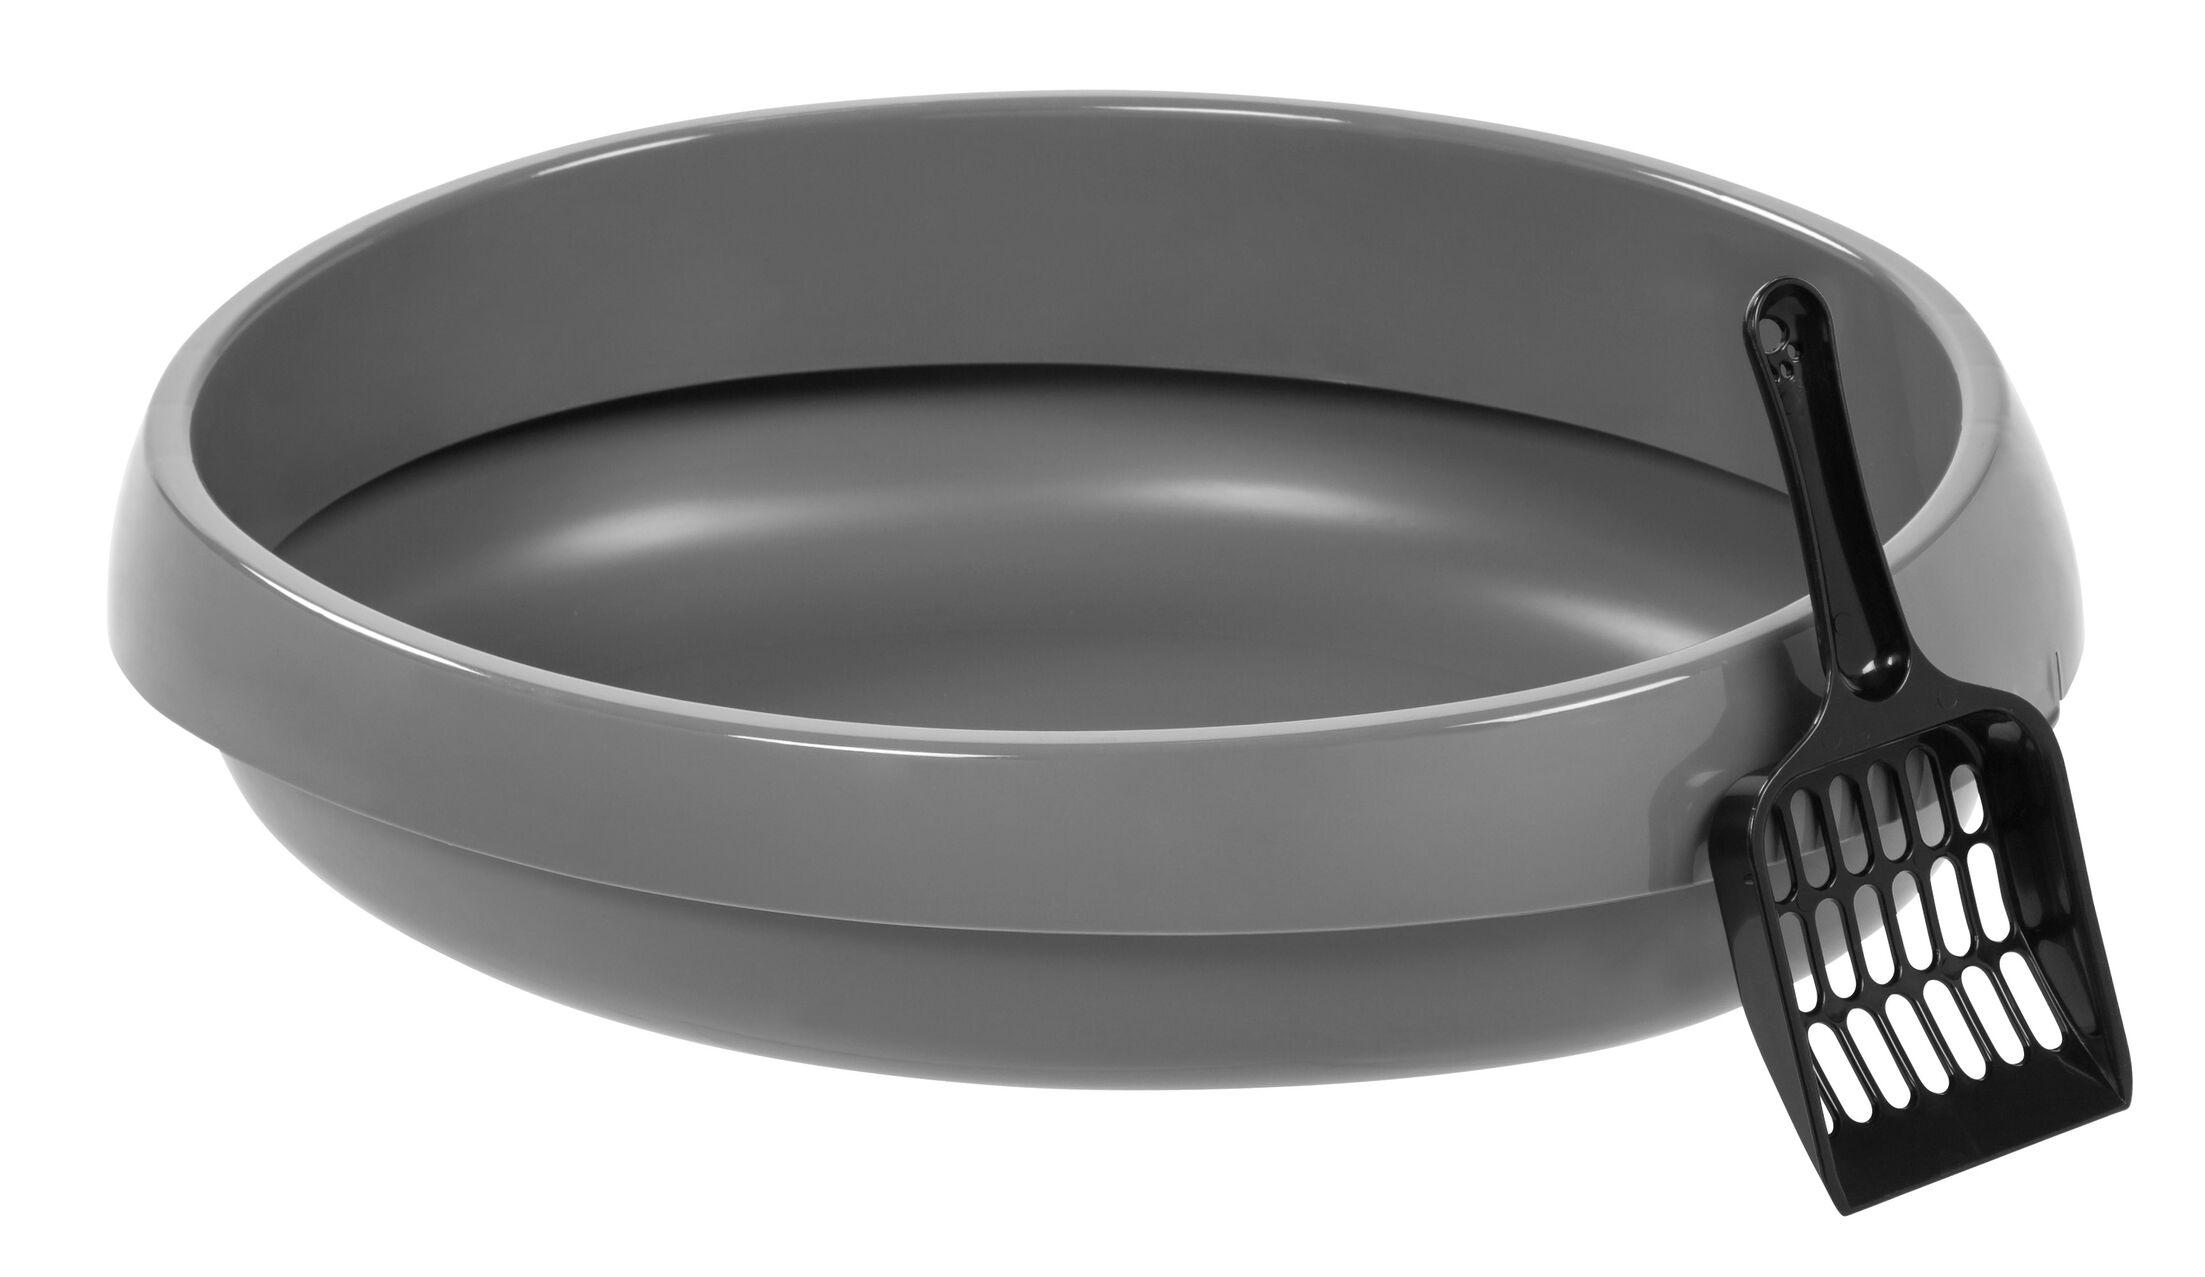 Rimmed Pan Liner 6 Pack Color: Gray